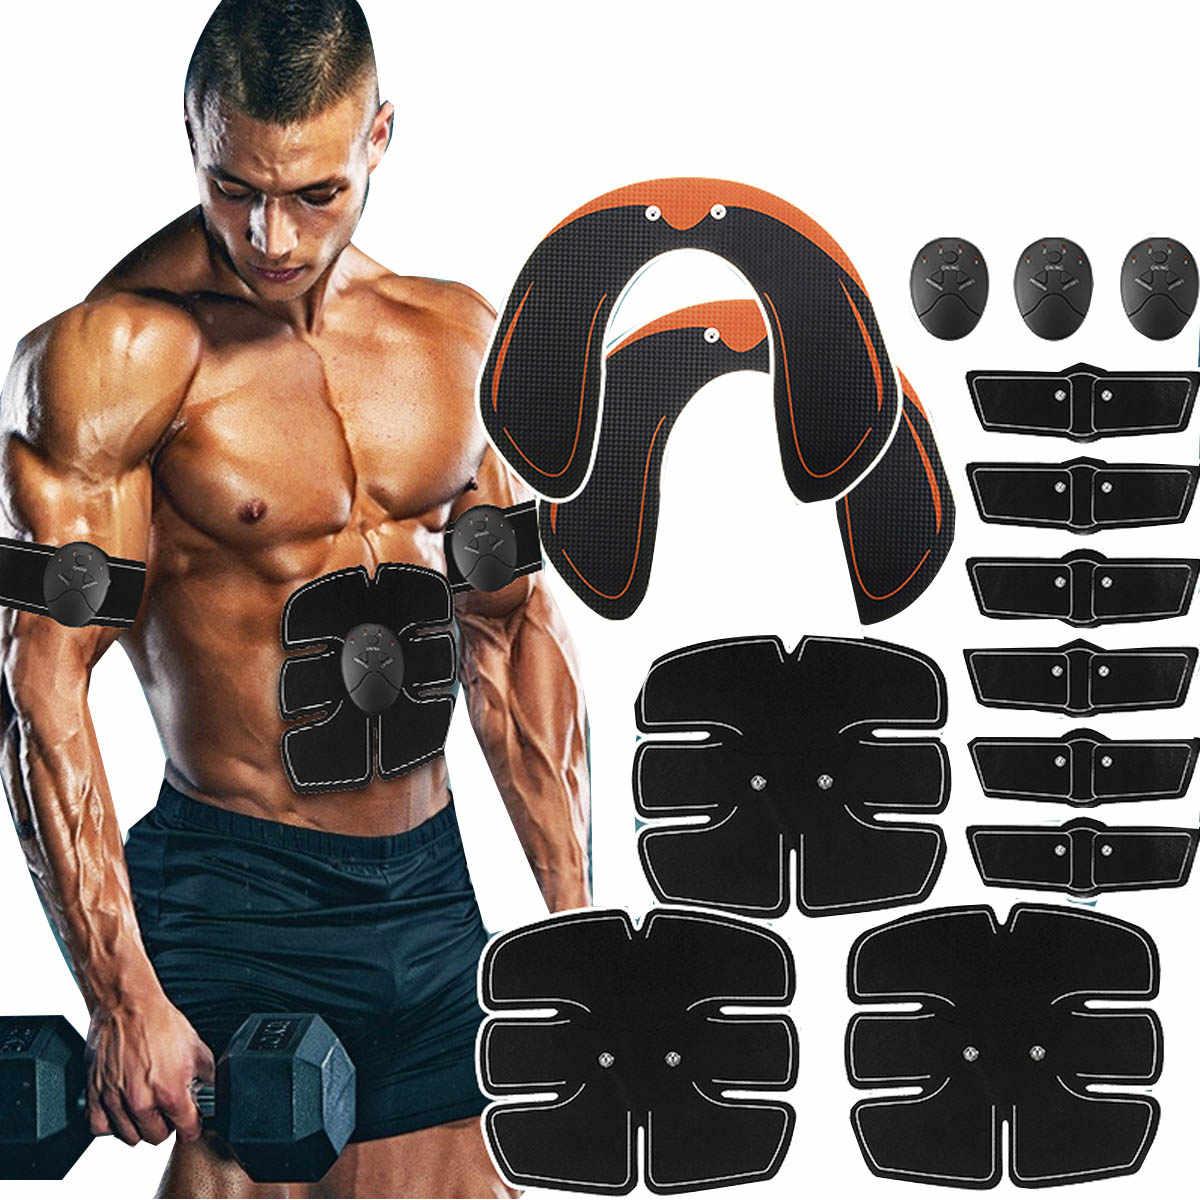 14 Buah/Set Getaran Stimulasi Otot Pelatihan Hip ABS Pantat Angkat Latihan Tubuh Pembentuk Otot Listrik Pelatihan Pijat